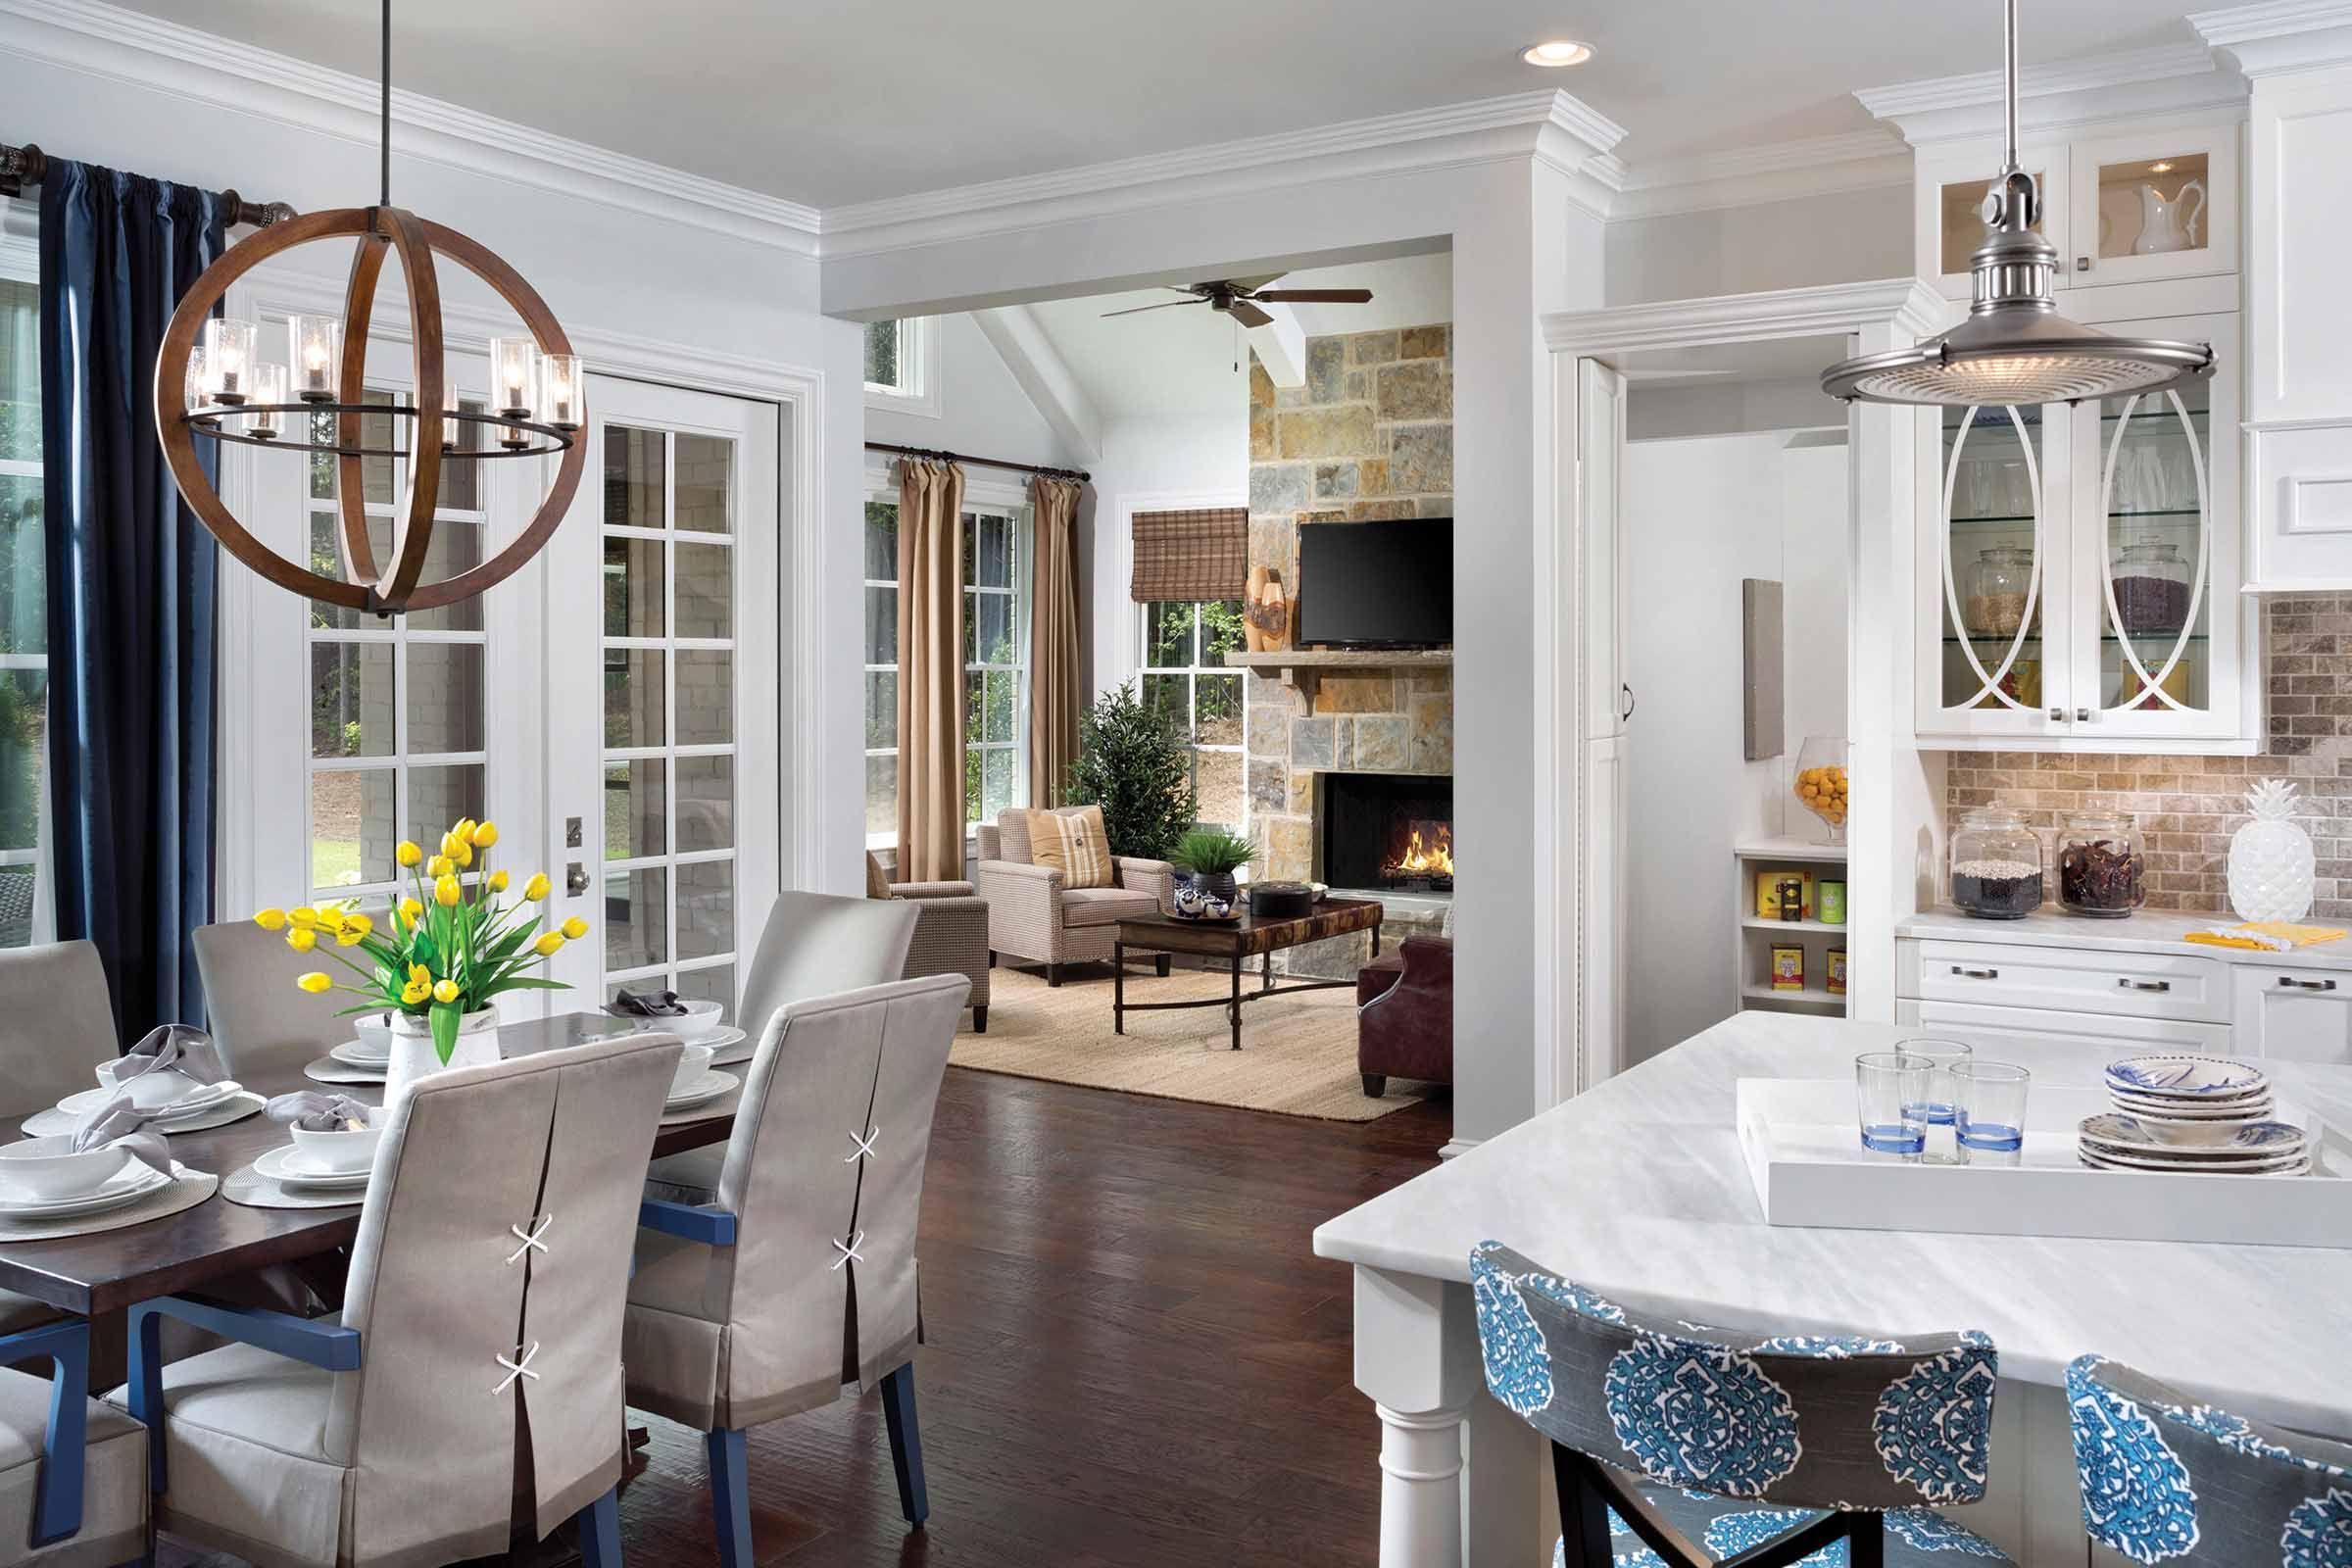 254491329f_mornjpg 24001600 luxury house plans home